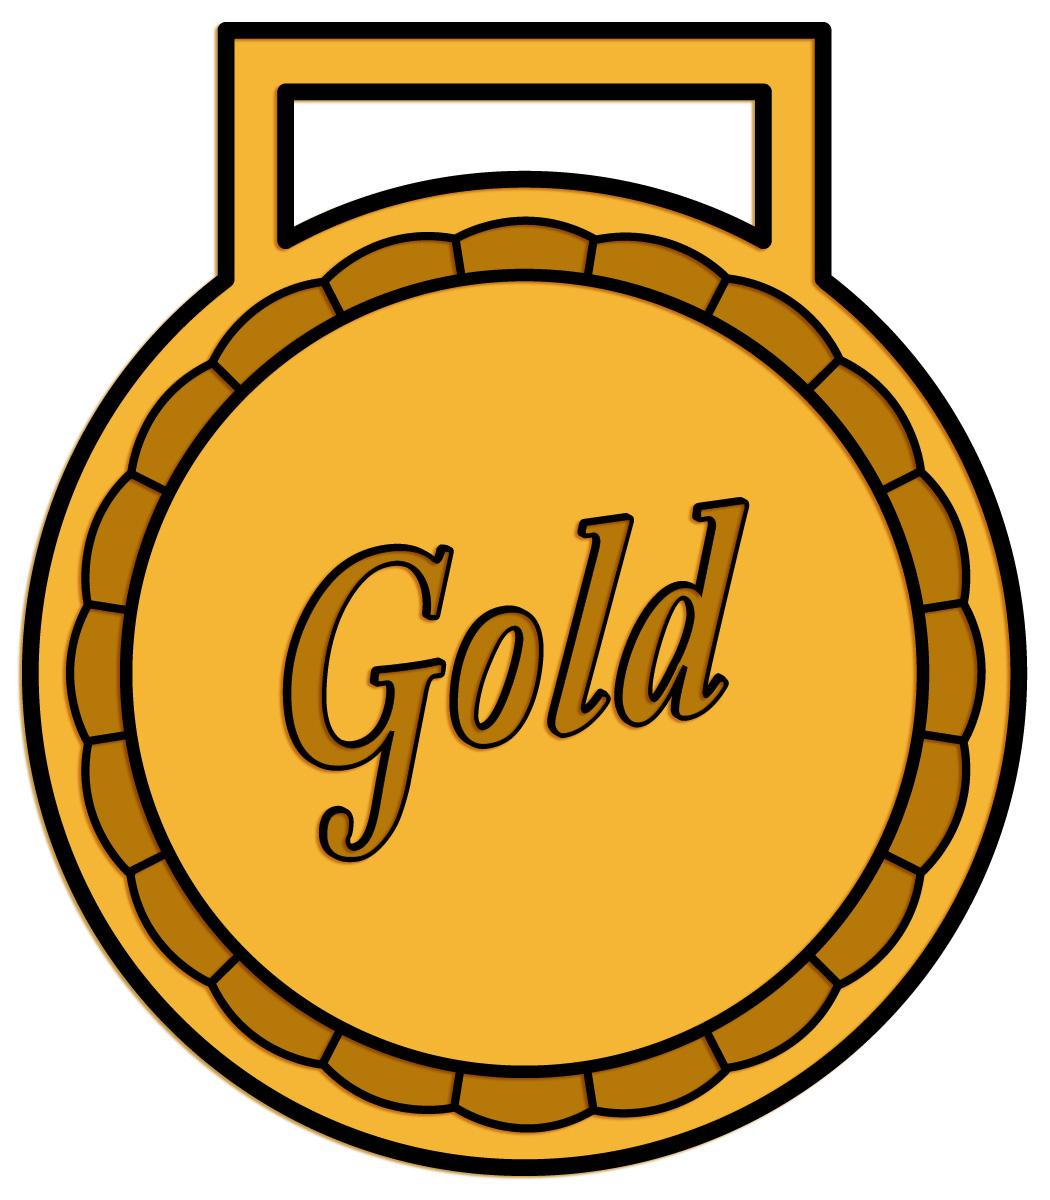 Gold award clipart danasojdb top 2